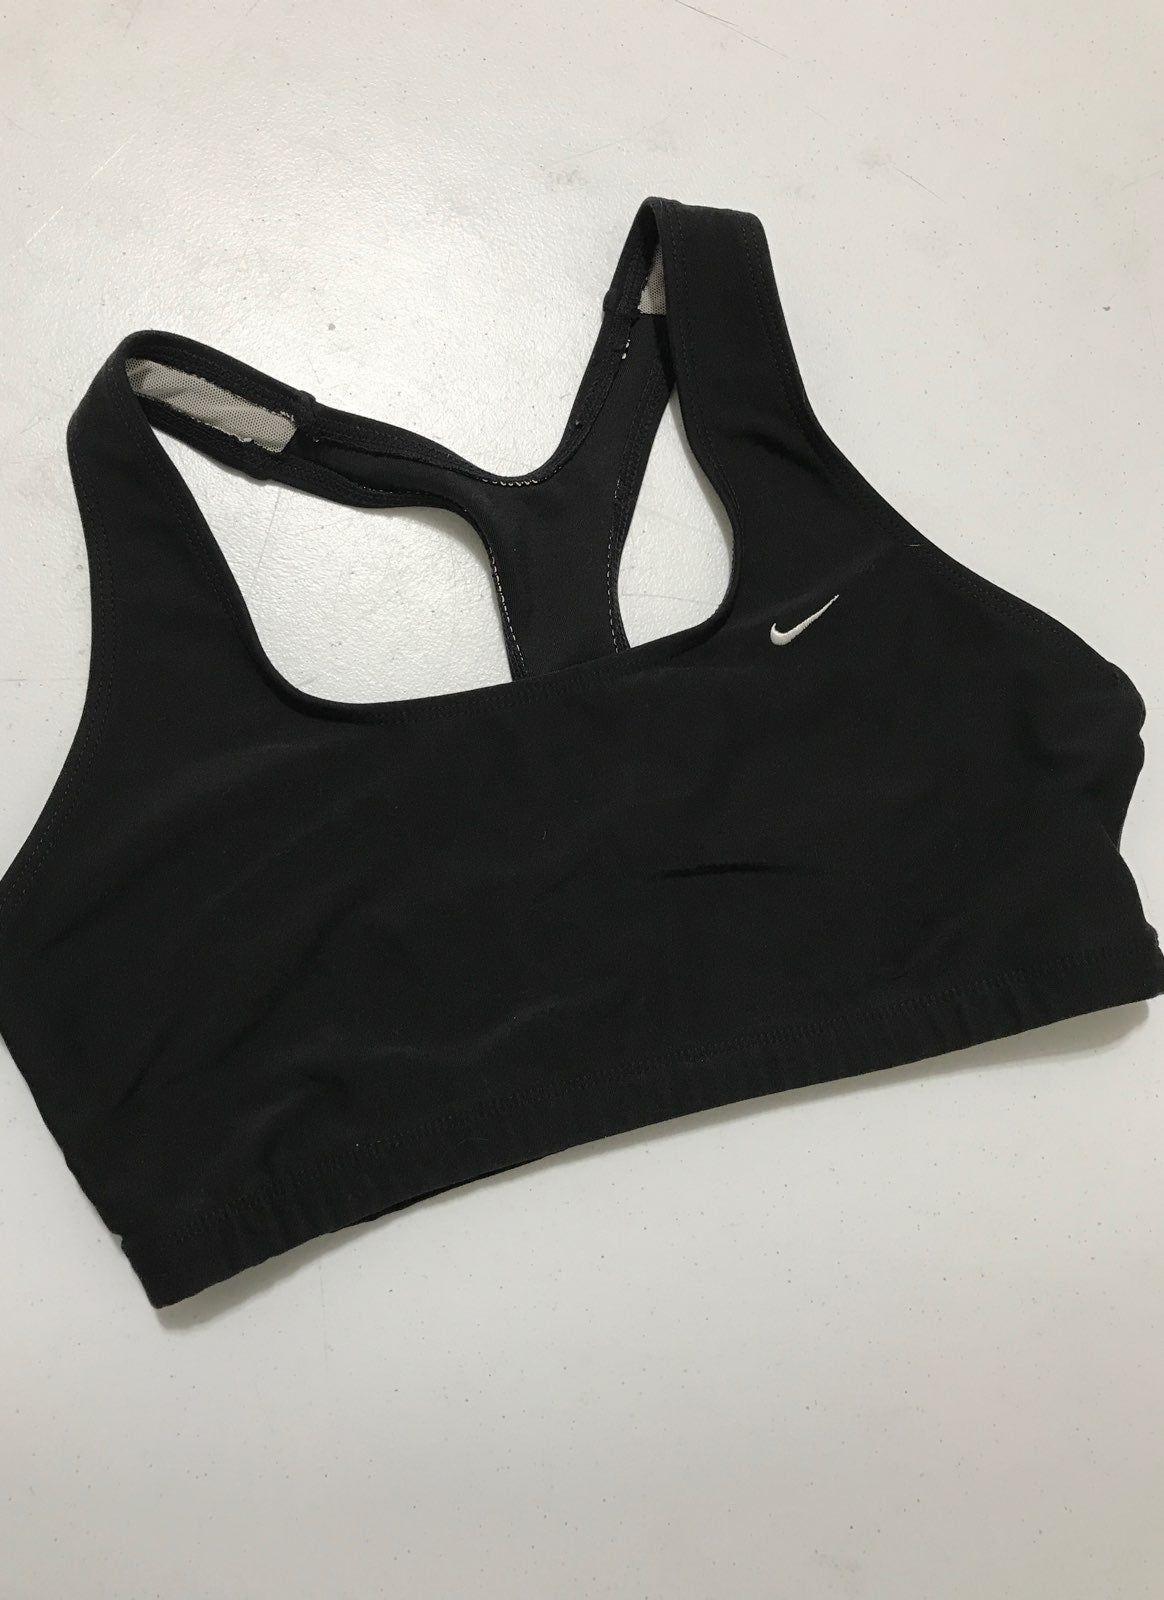 Black Sports Bra Size Medium Embroidered Swoosh Good Condition Sports Bra Nike Sports Bra Black Sports Bra